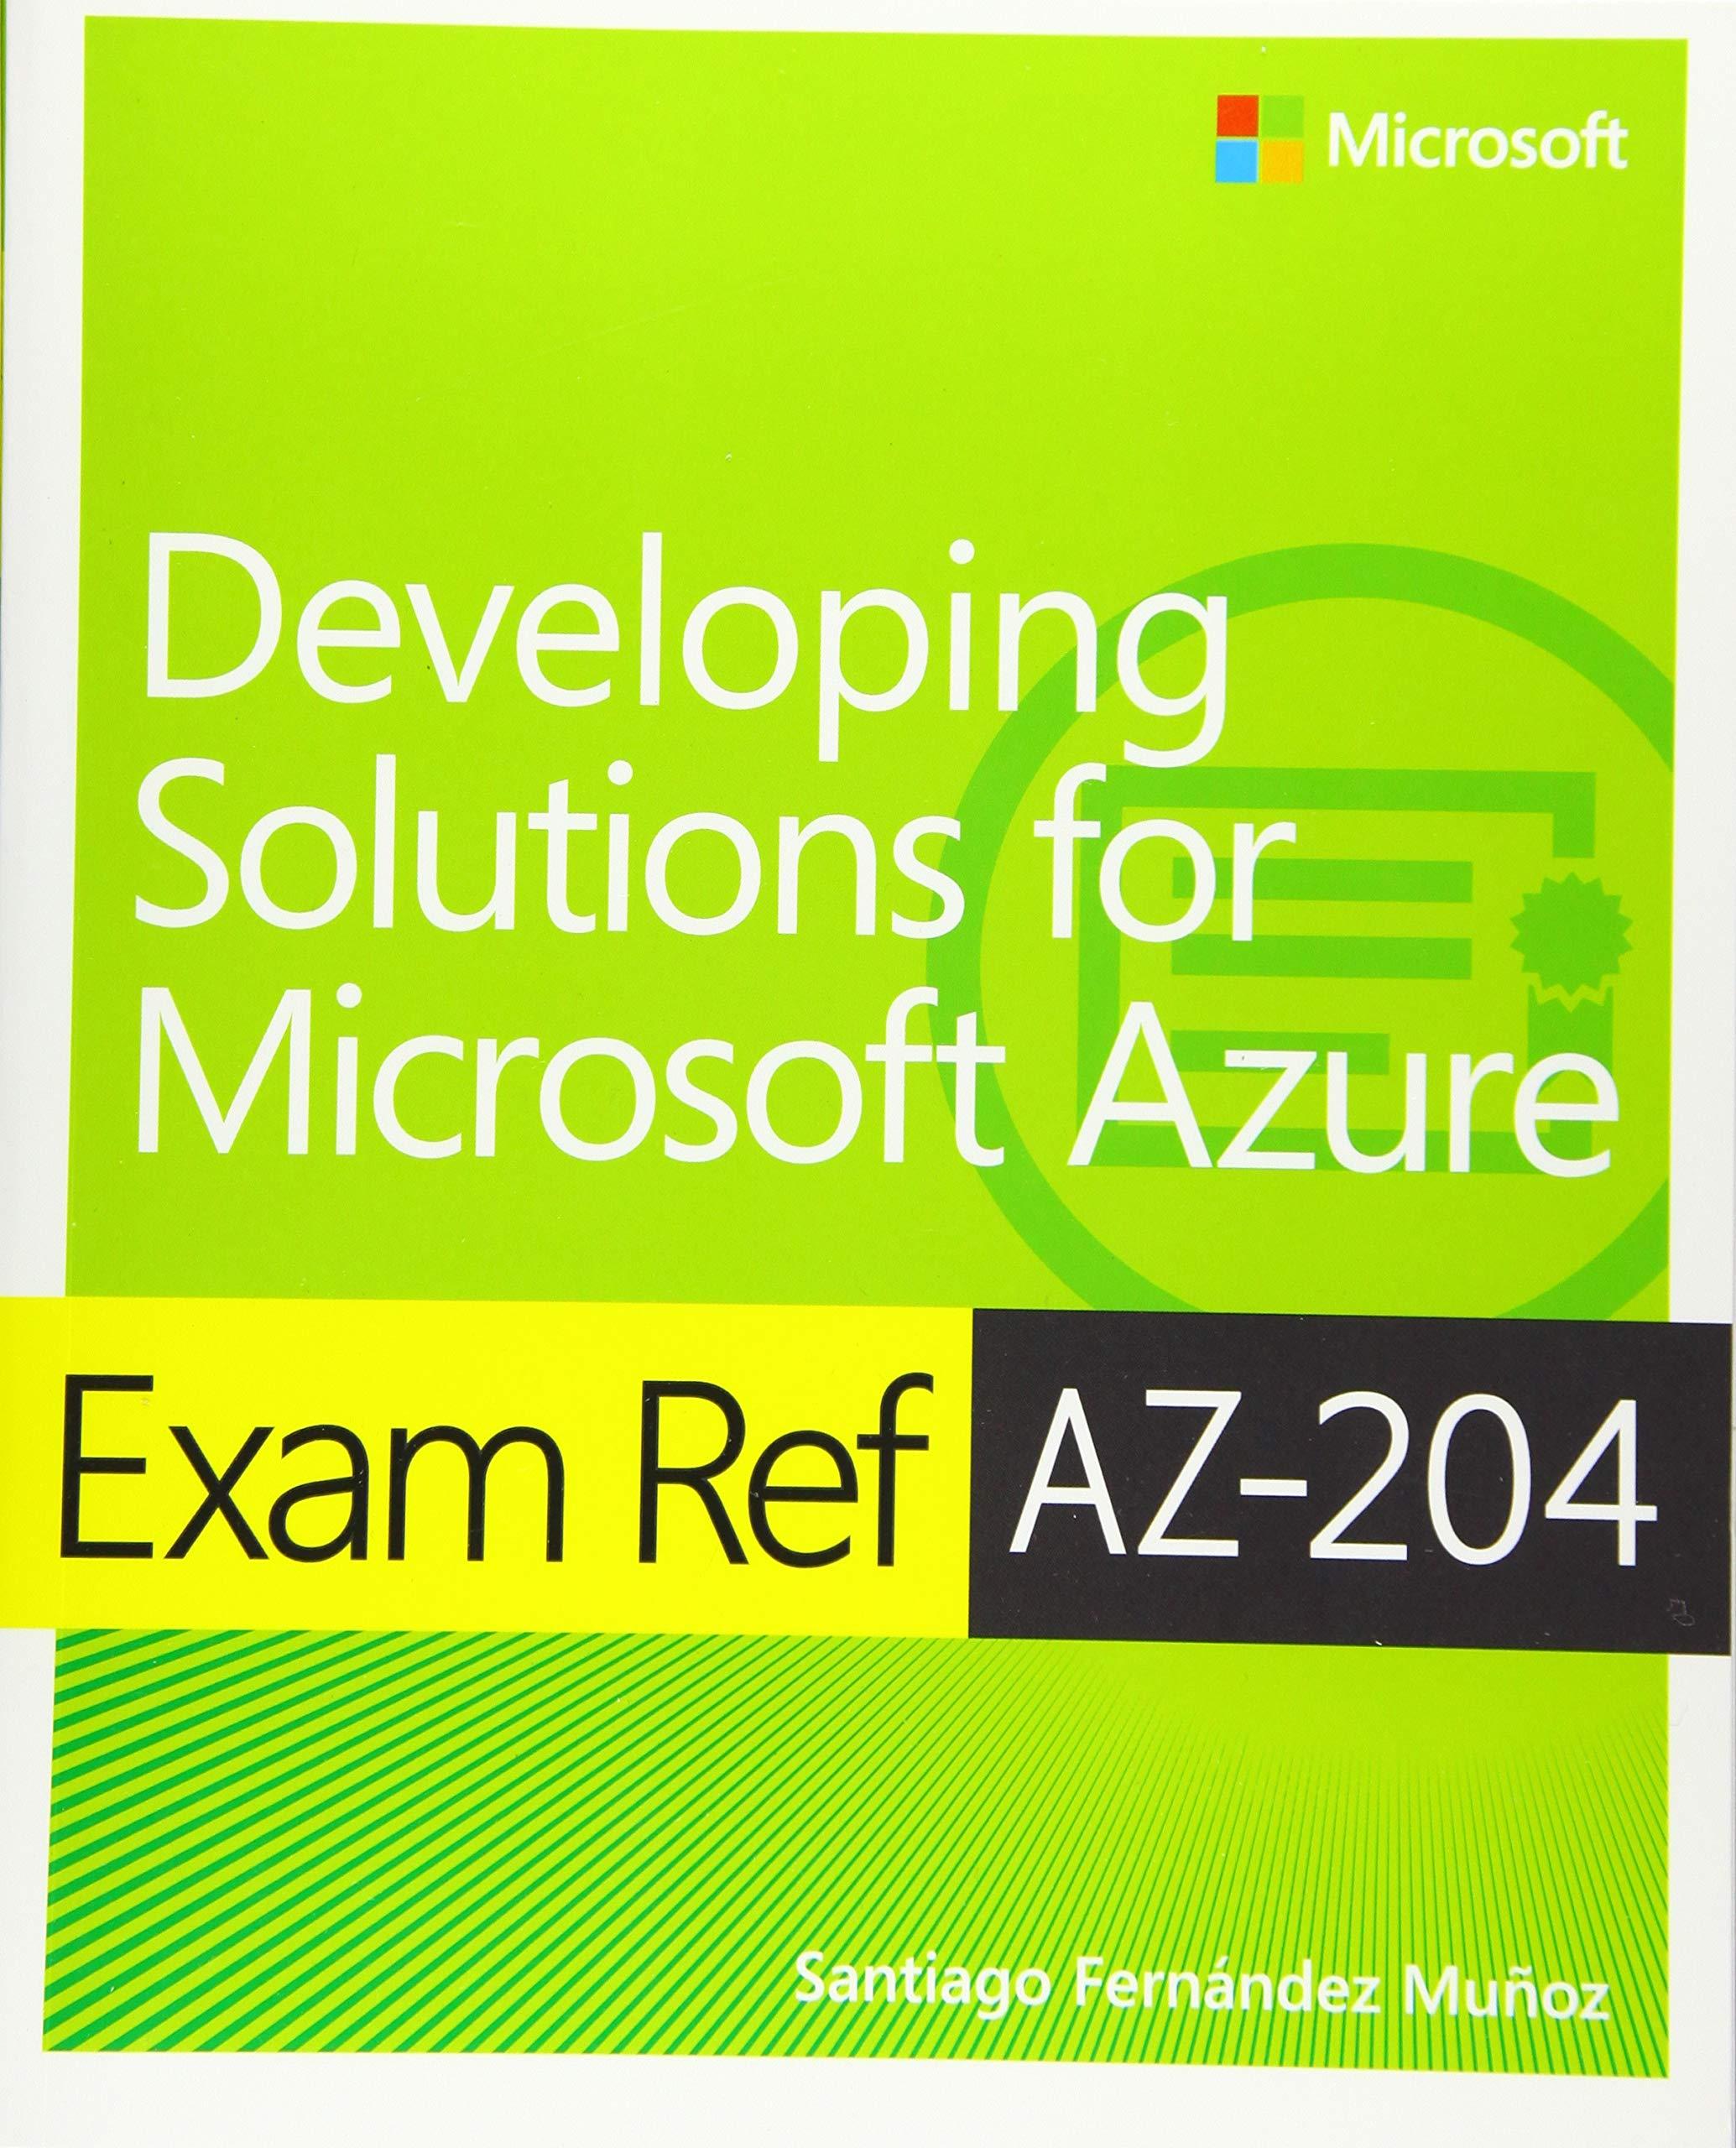 Exam Ref AZ-204 Developing Solutions for Microsoft Azure